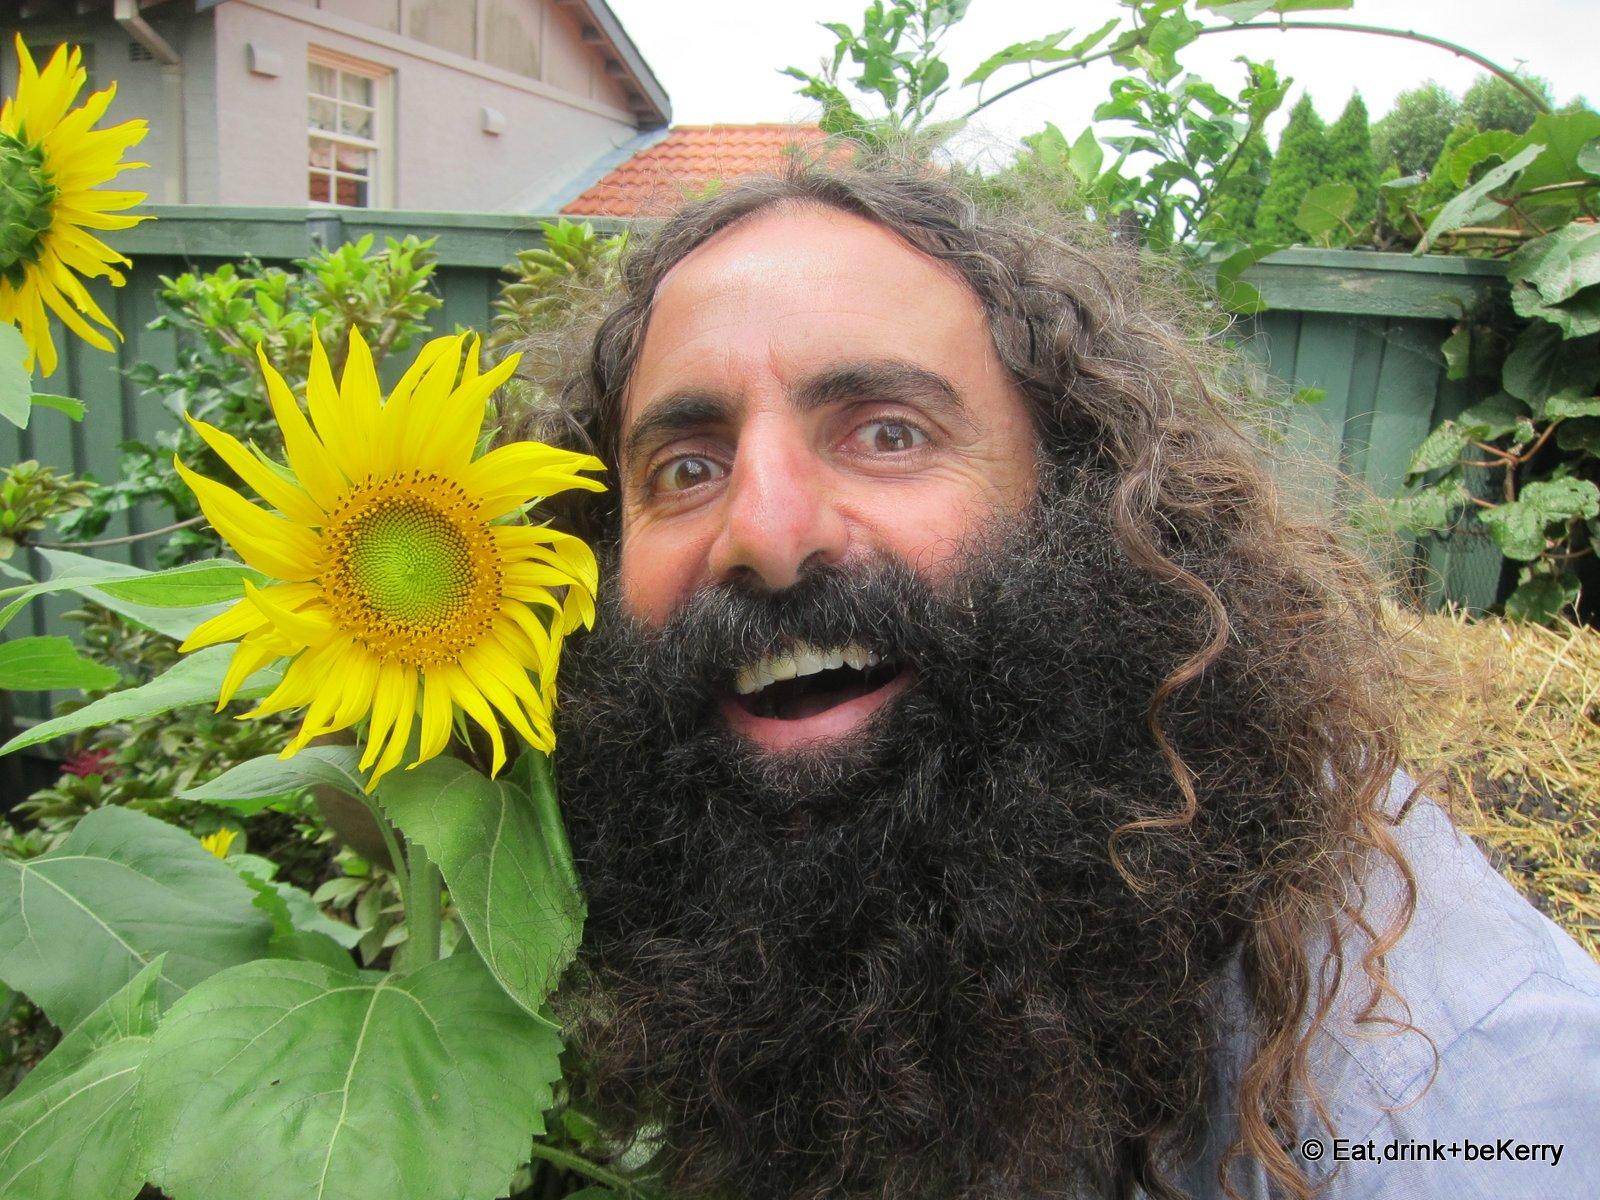 Costa Georgiadis The Host Of Gardening Australia Beards